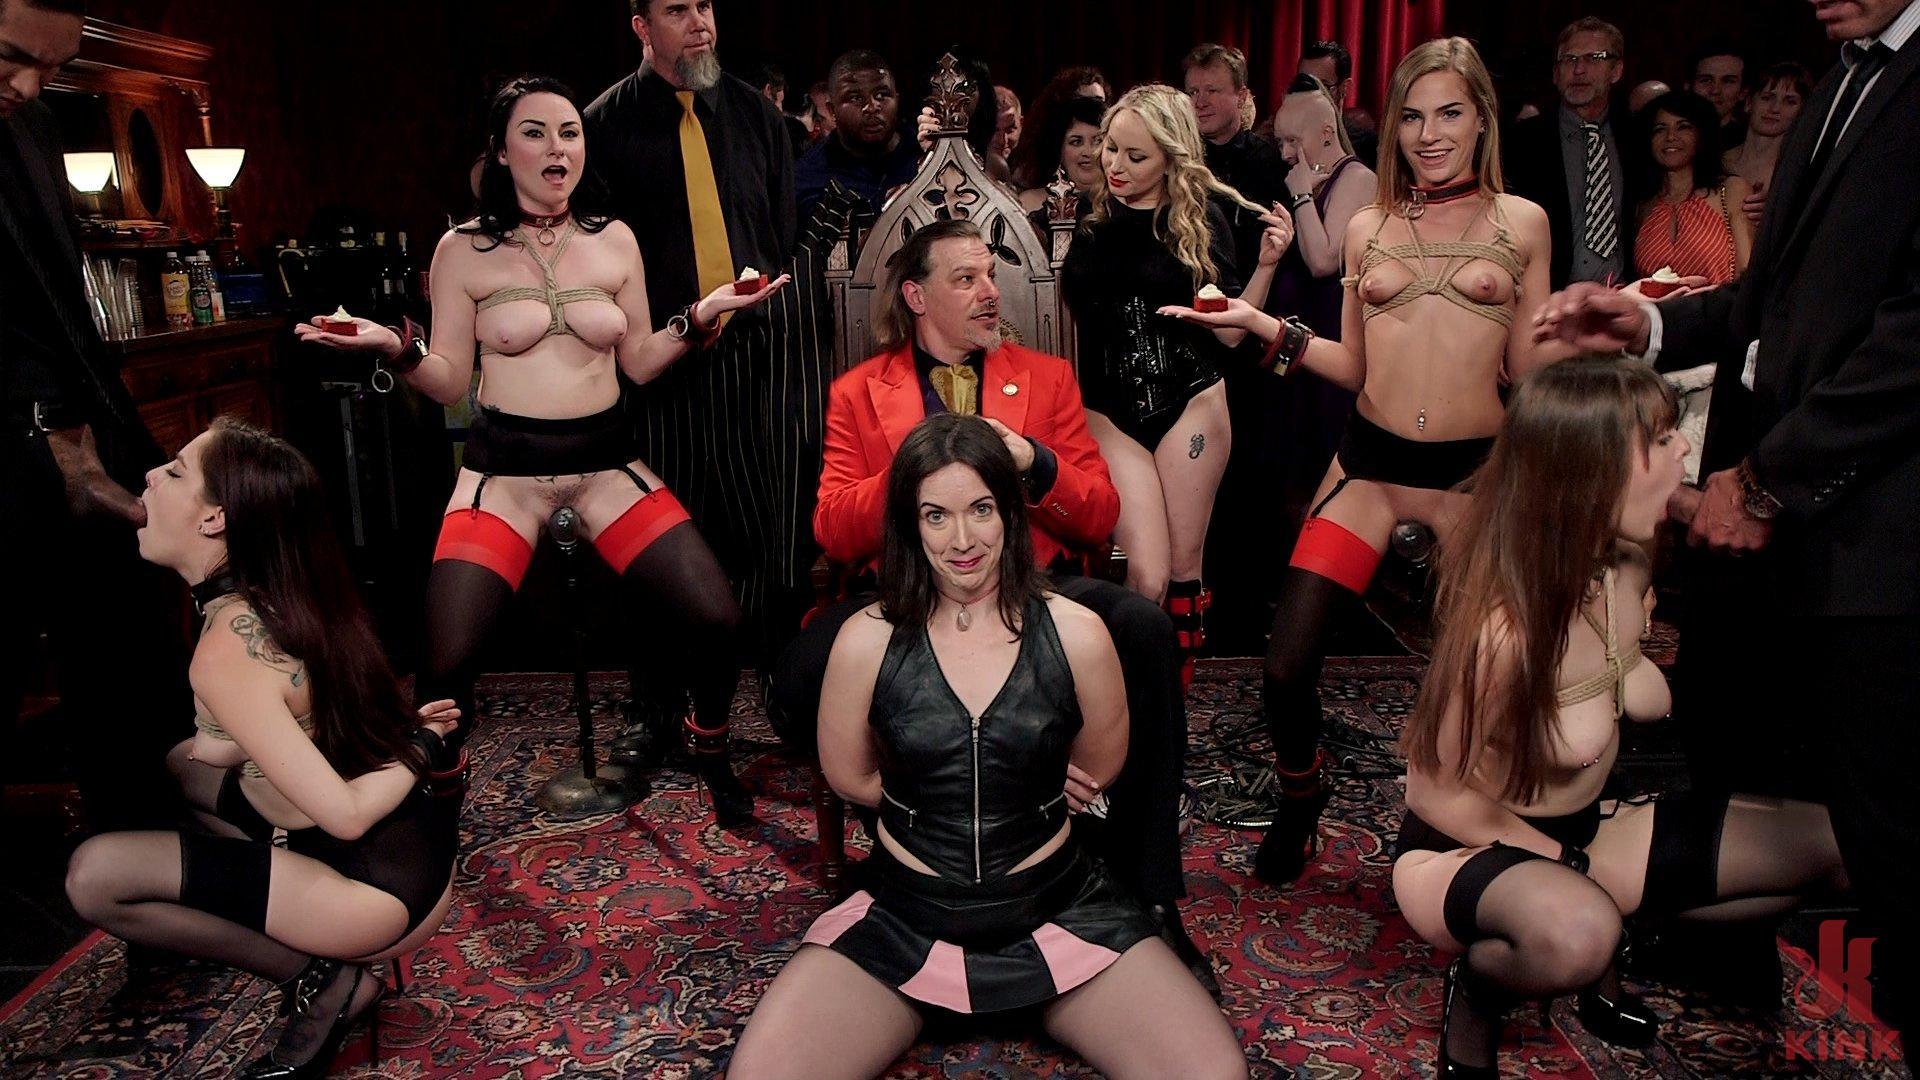 The-Stewards-Birthday-Slave-Orgy